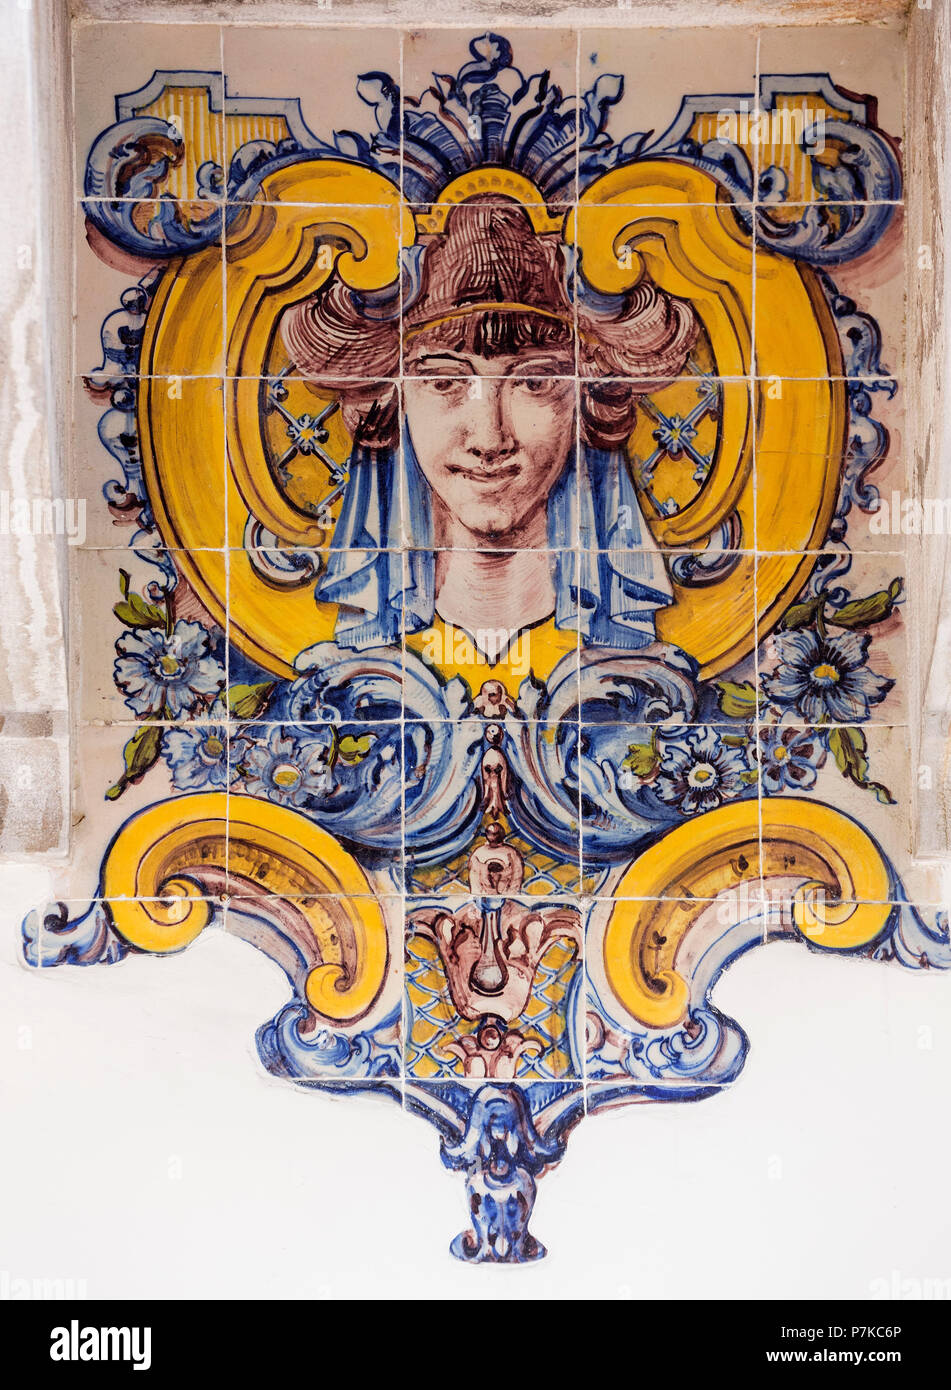 Women's heads on Azulejos tiles, Art Nouveau, Lisbon, Portugal, Europe - Stock Image